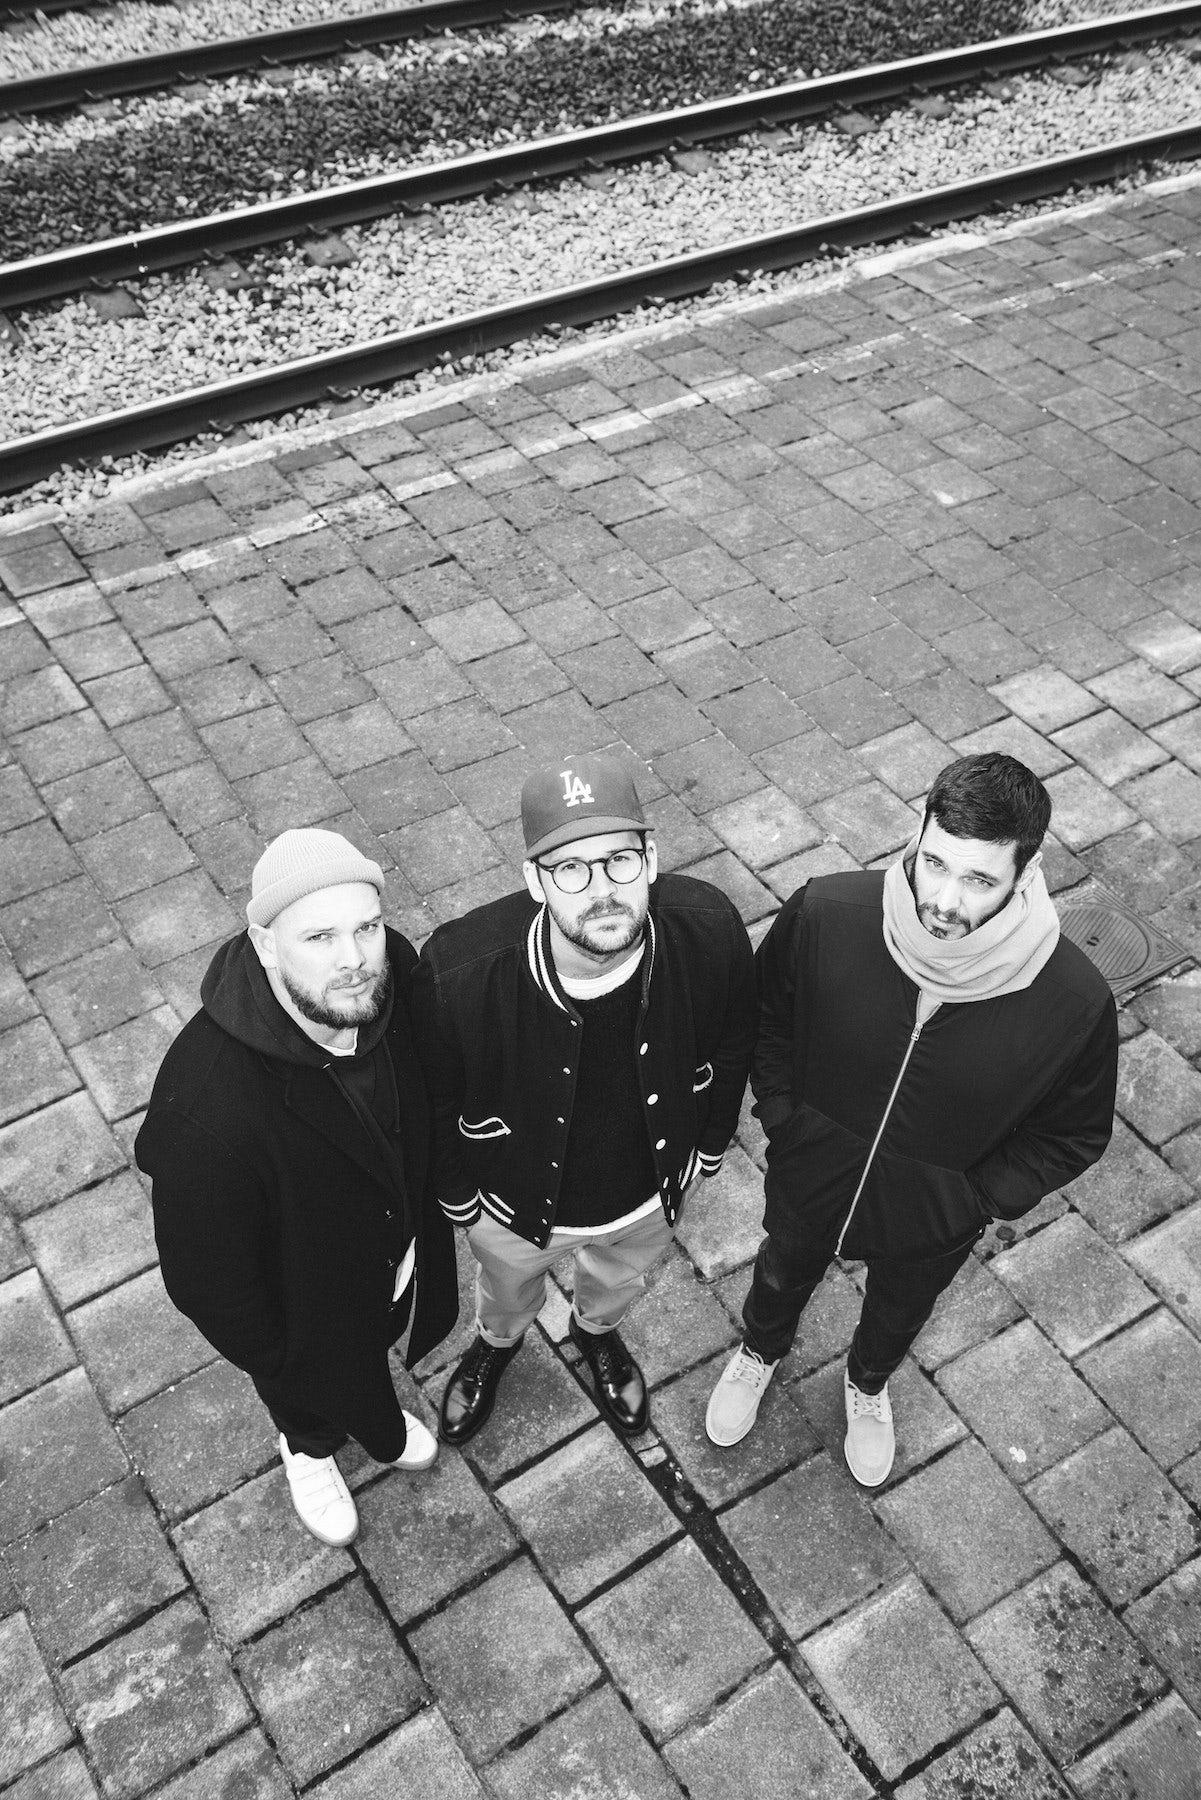 Matthias Weber, Niklaus Hodel and Florian Feder | Photo: Senne van der Ven